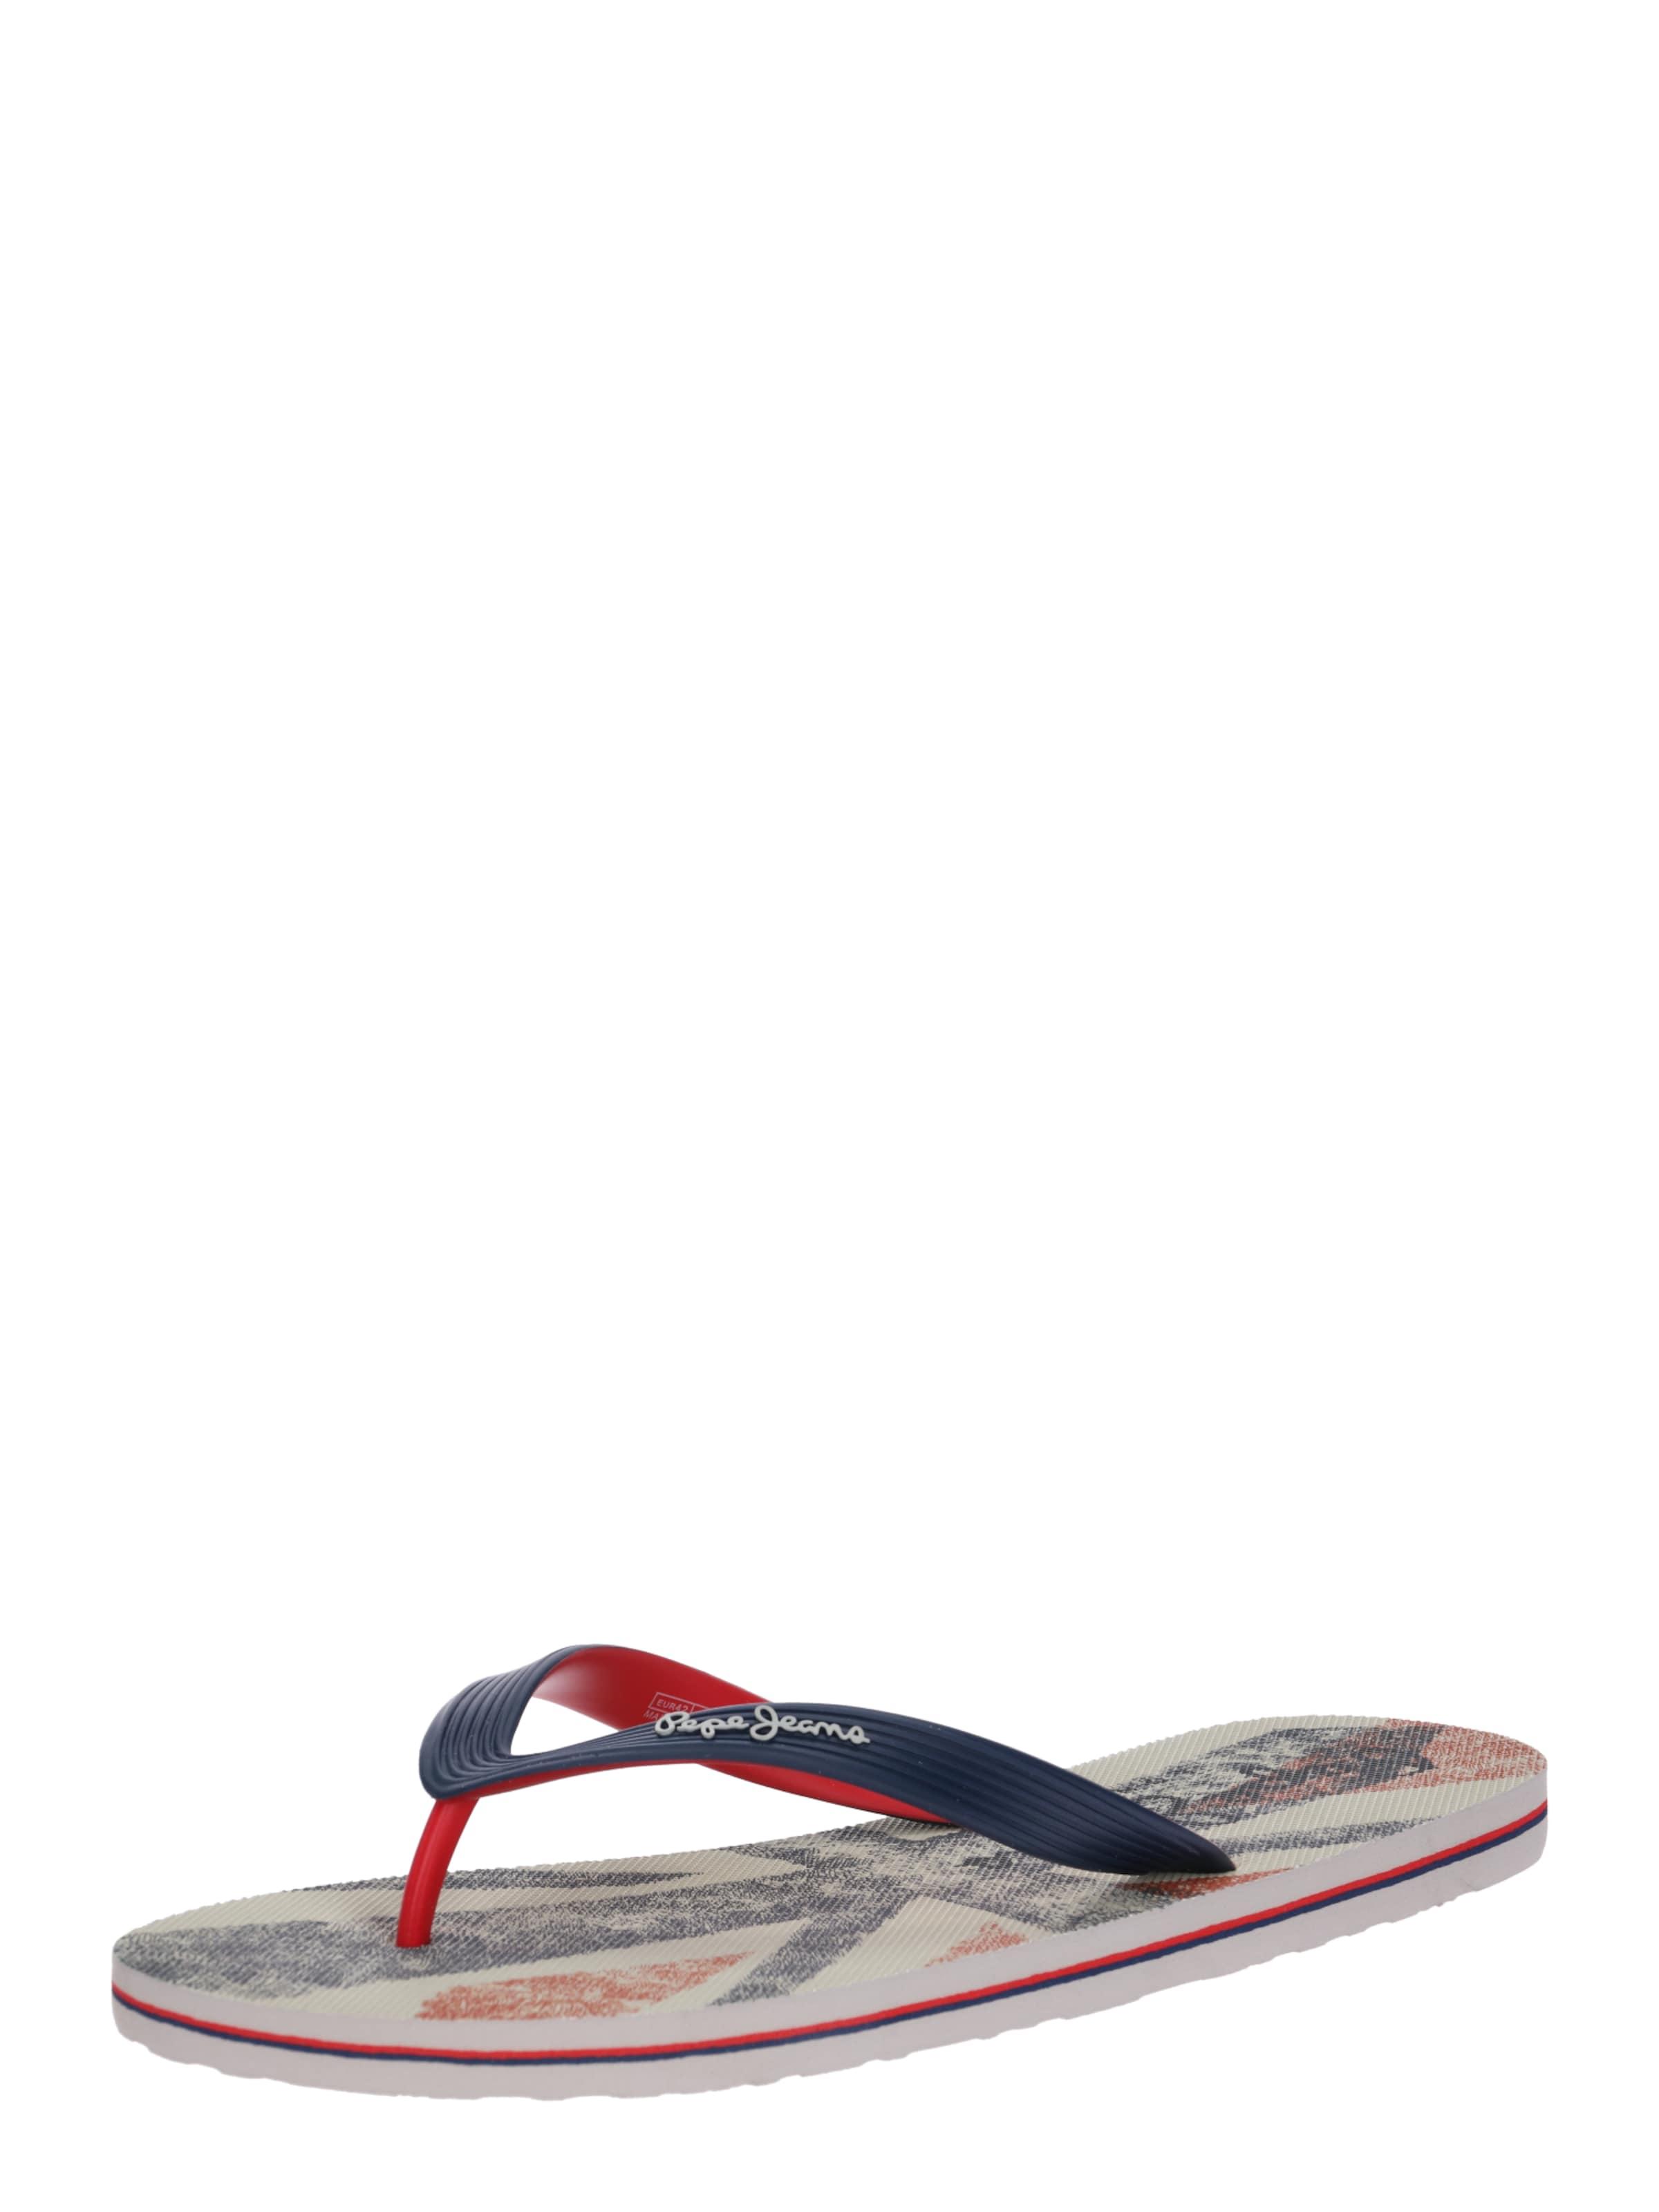 Jeans Pepe 'hawi Ian' CremeNachtblau In Sandale QCrxsohBtd